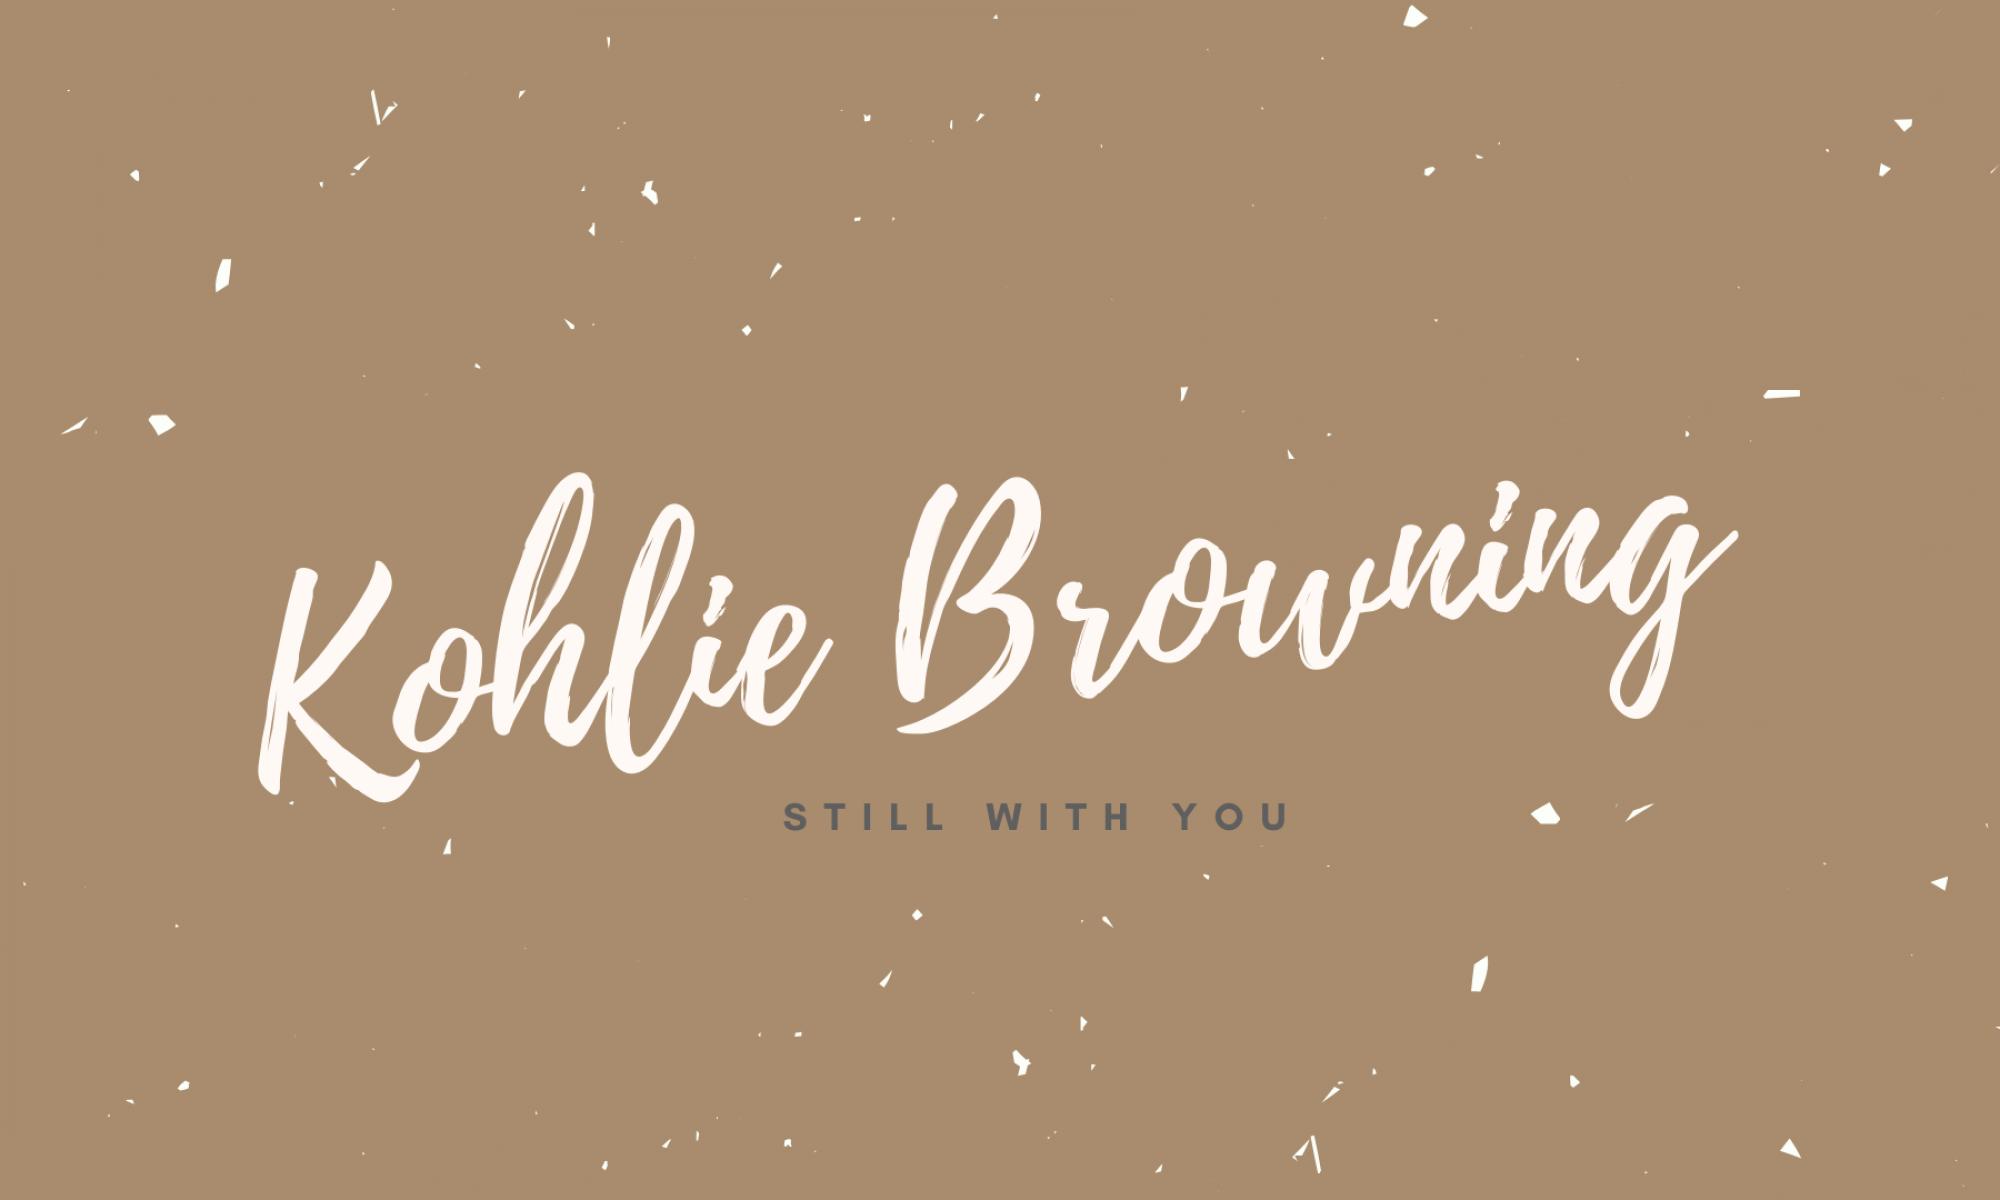 Kohlie Browning